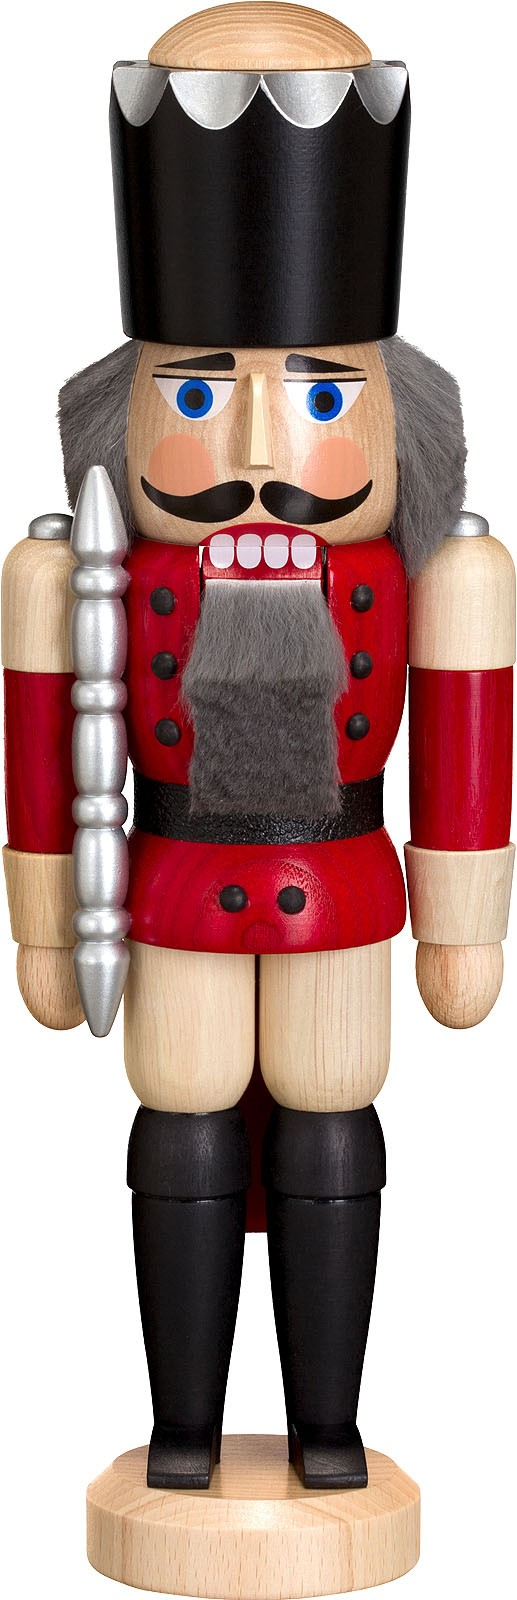 nutcracker king, ash tree glazed, red, 11.42 inches